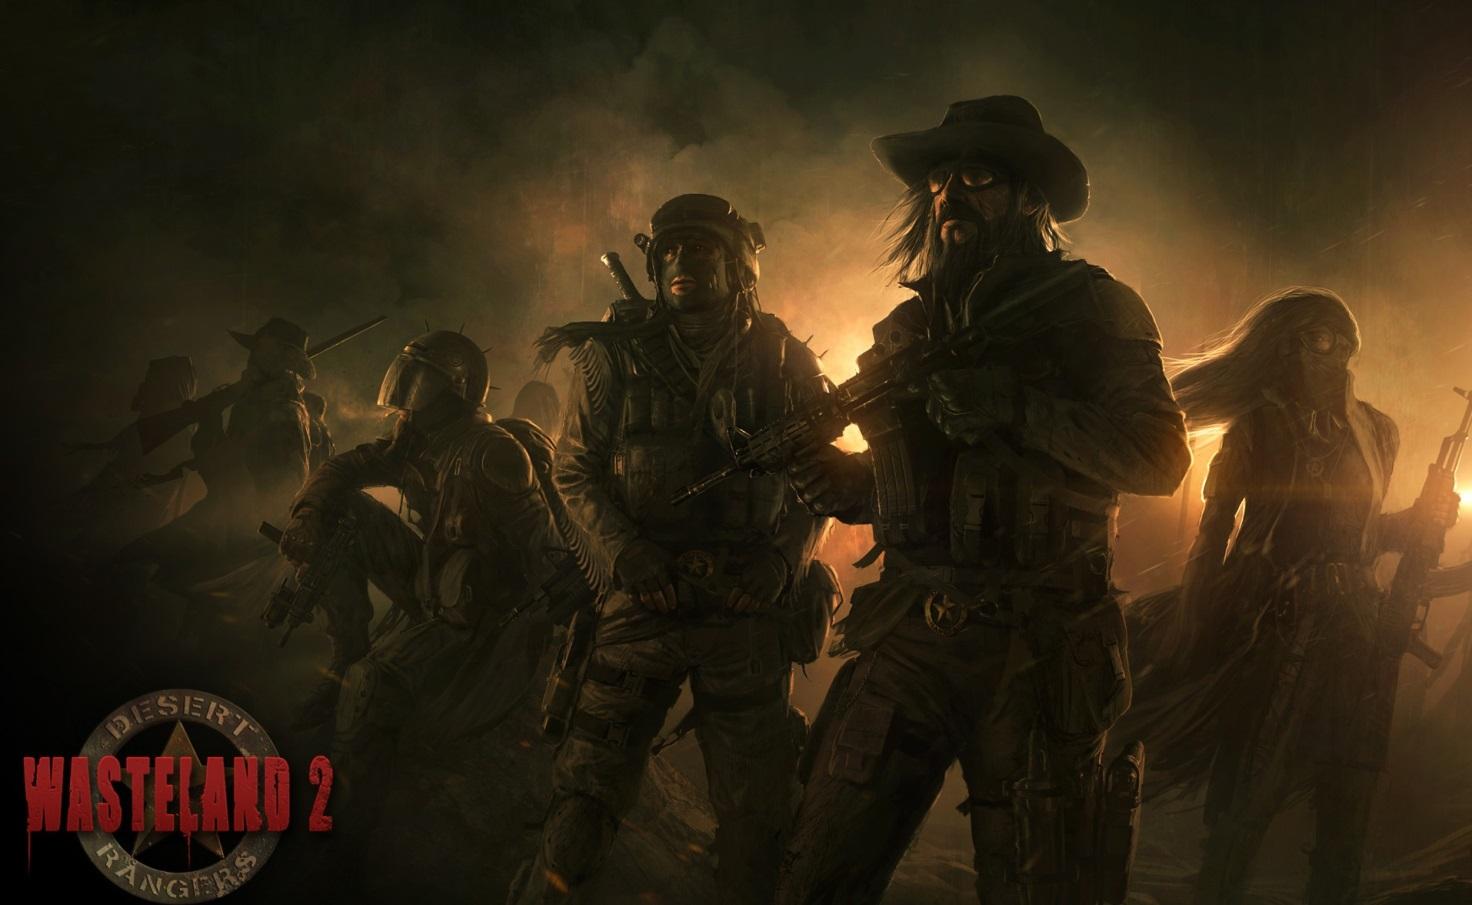 Картинки по запросу Wasteland 2